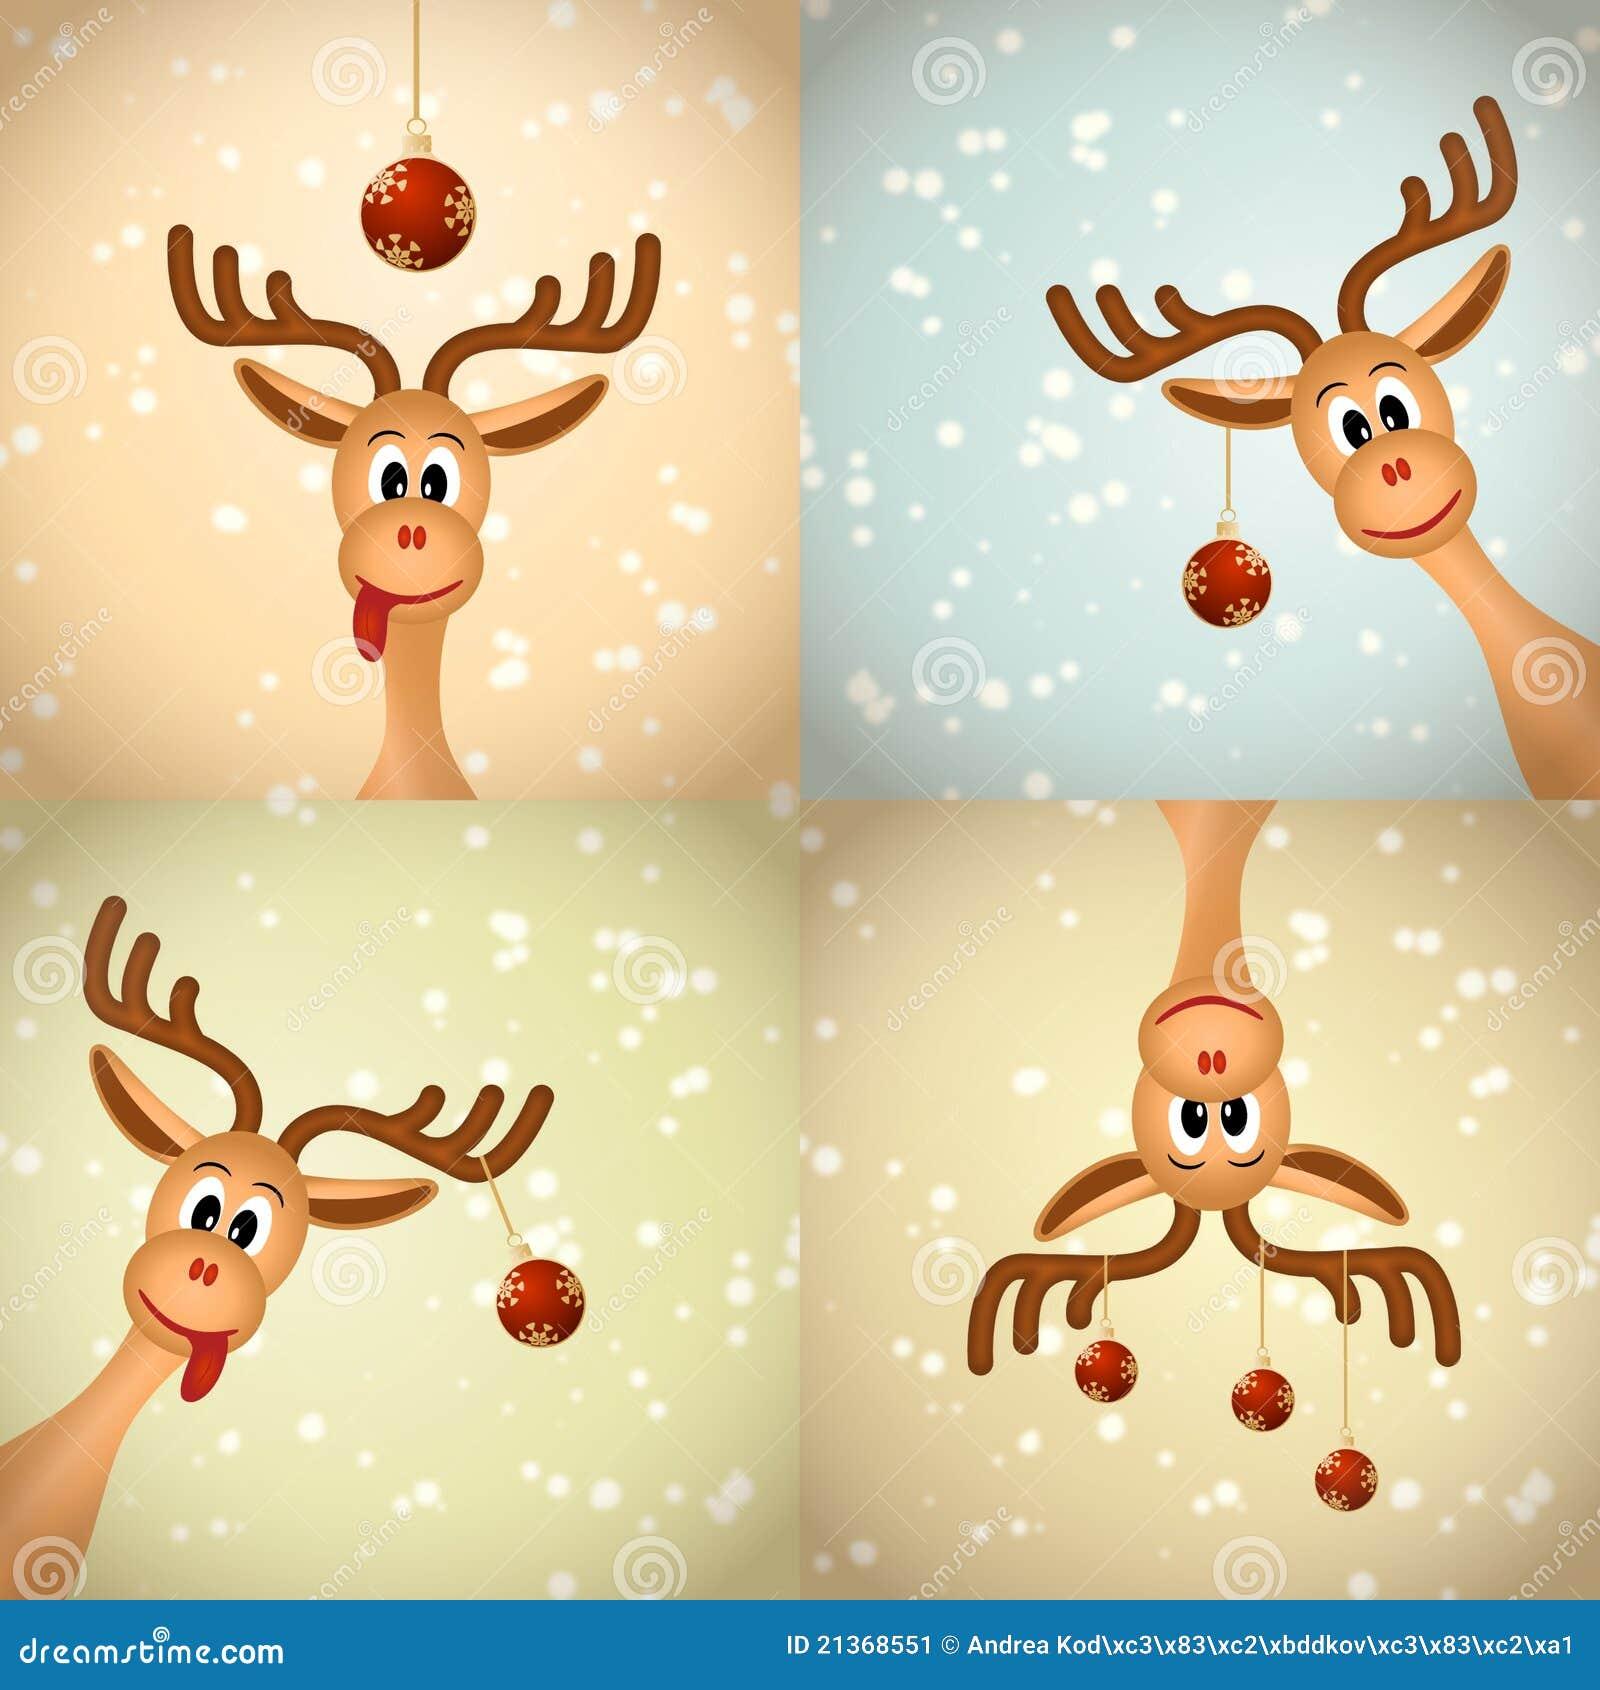 http://thumbs.dreamstime.com/z/four-funny-christmas-reindeer-21368551.jpg